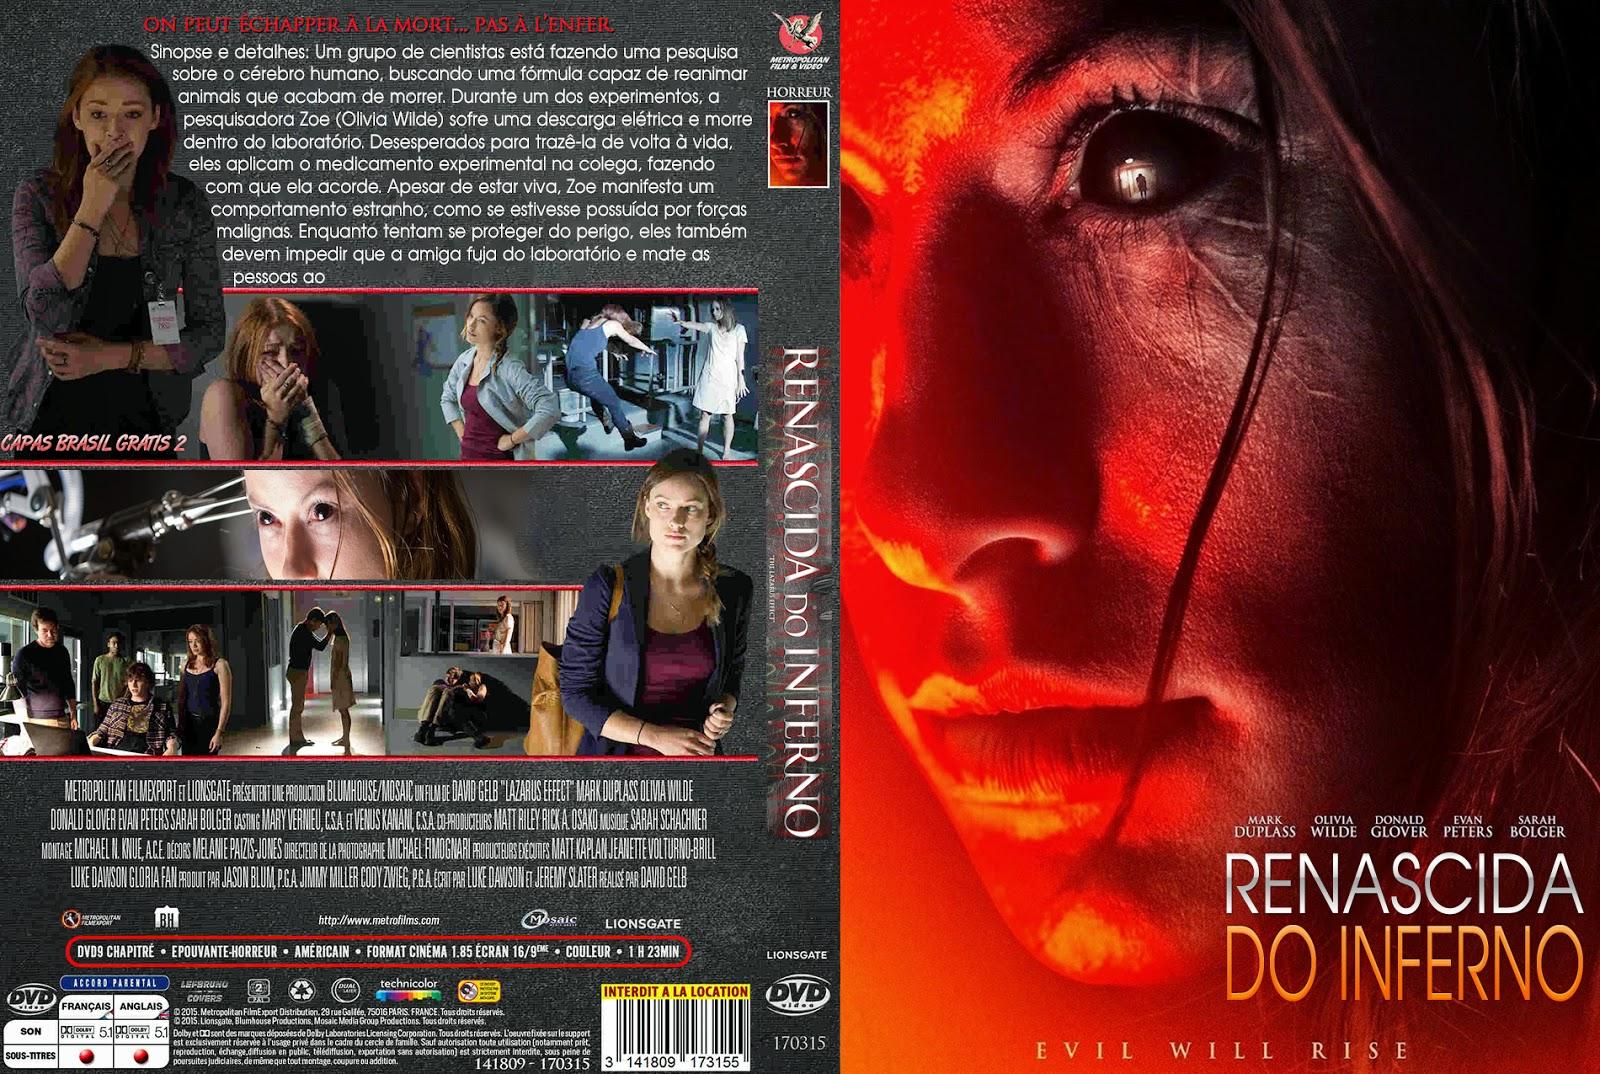 Renascida do Inferno DVD-R Renascida 2Bdo 2BInferno 2B02